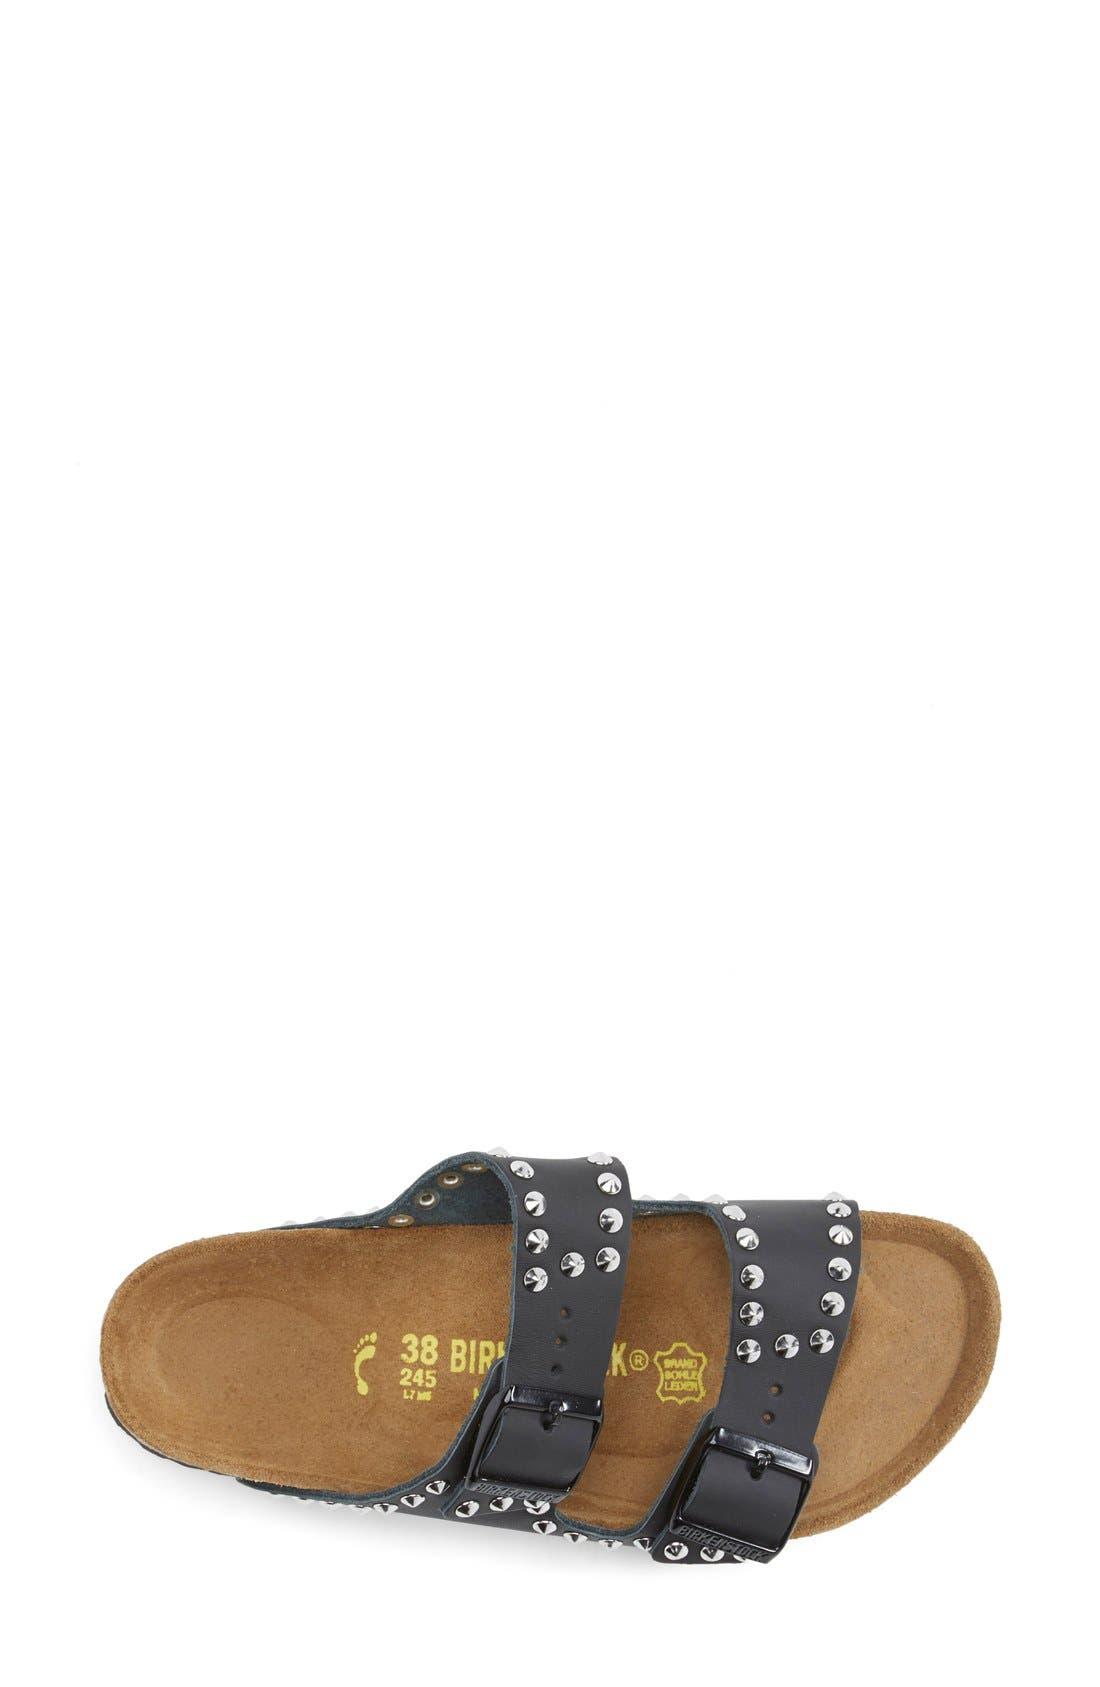 Alternate Image 3  - Birkenstock 'Arizona' Studded Leather Sandal (Women)